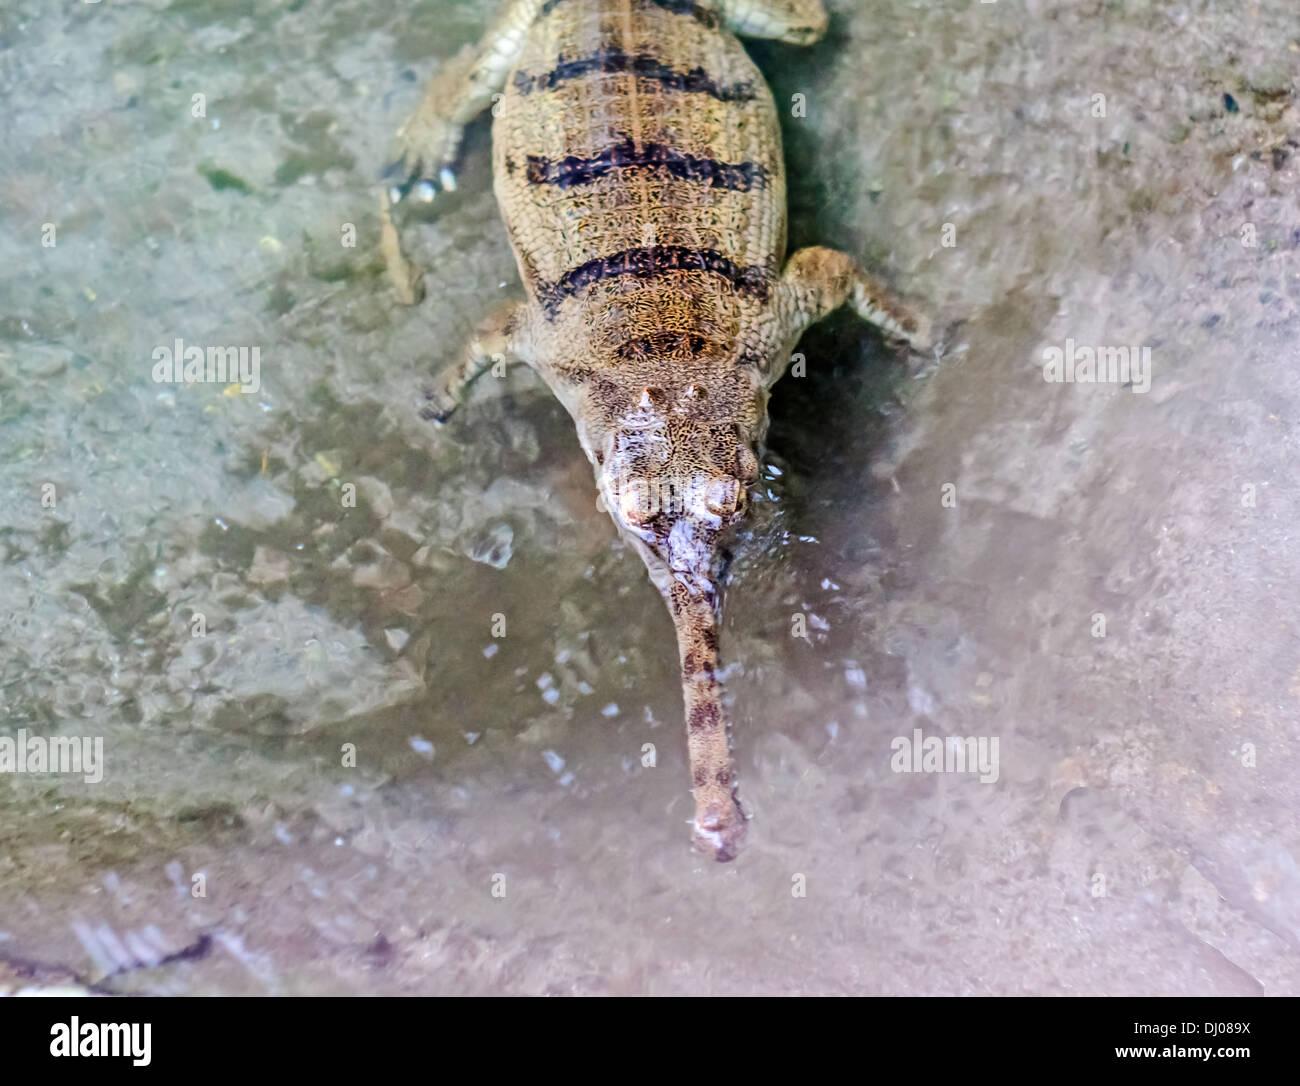 Crocodiles in captivity at Amo Chu crocodile Preservation Centre, Phuentsholing, Bhutan - Stock Image